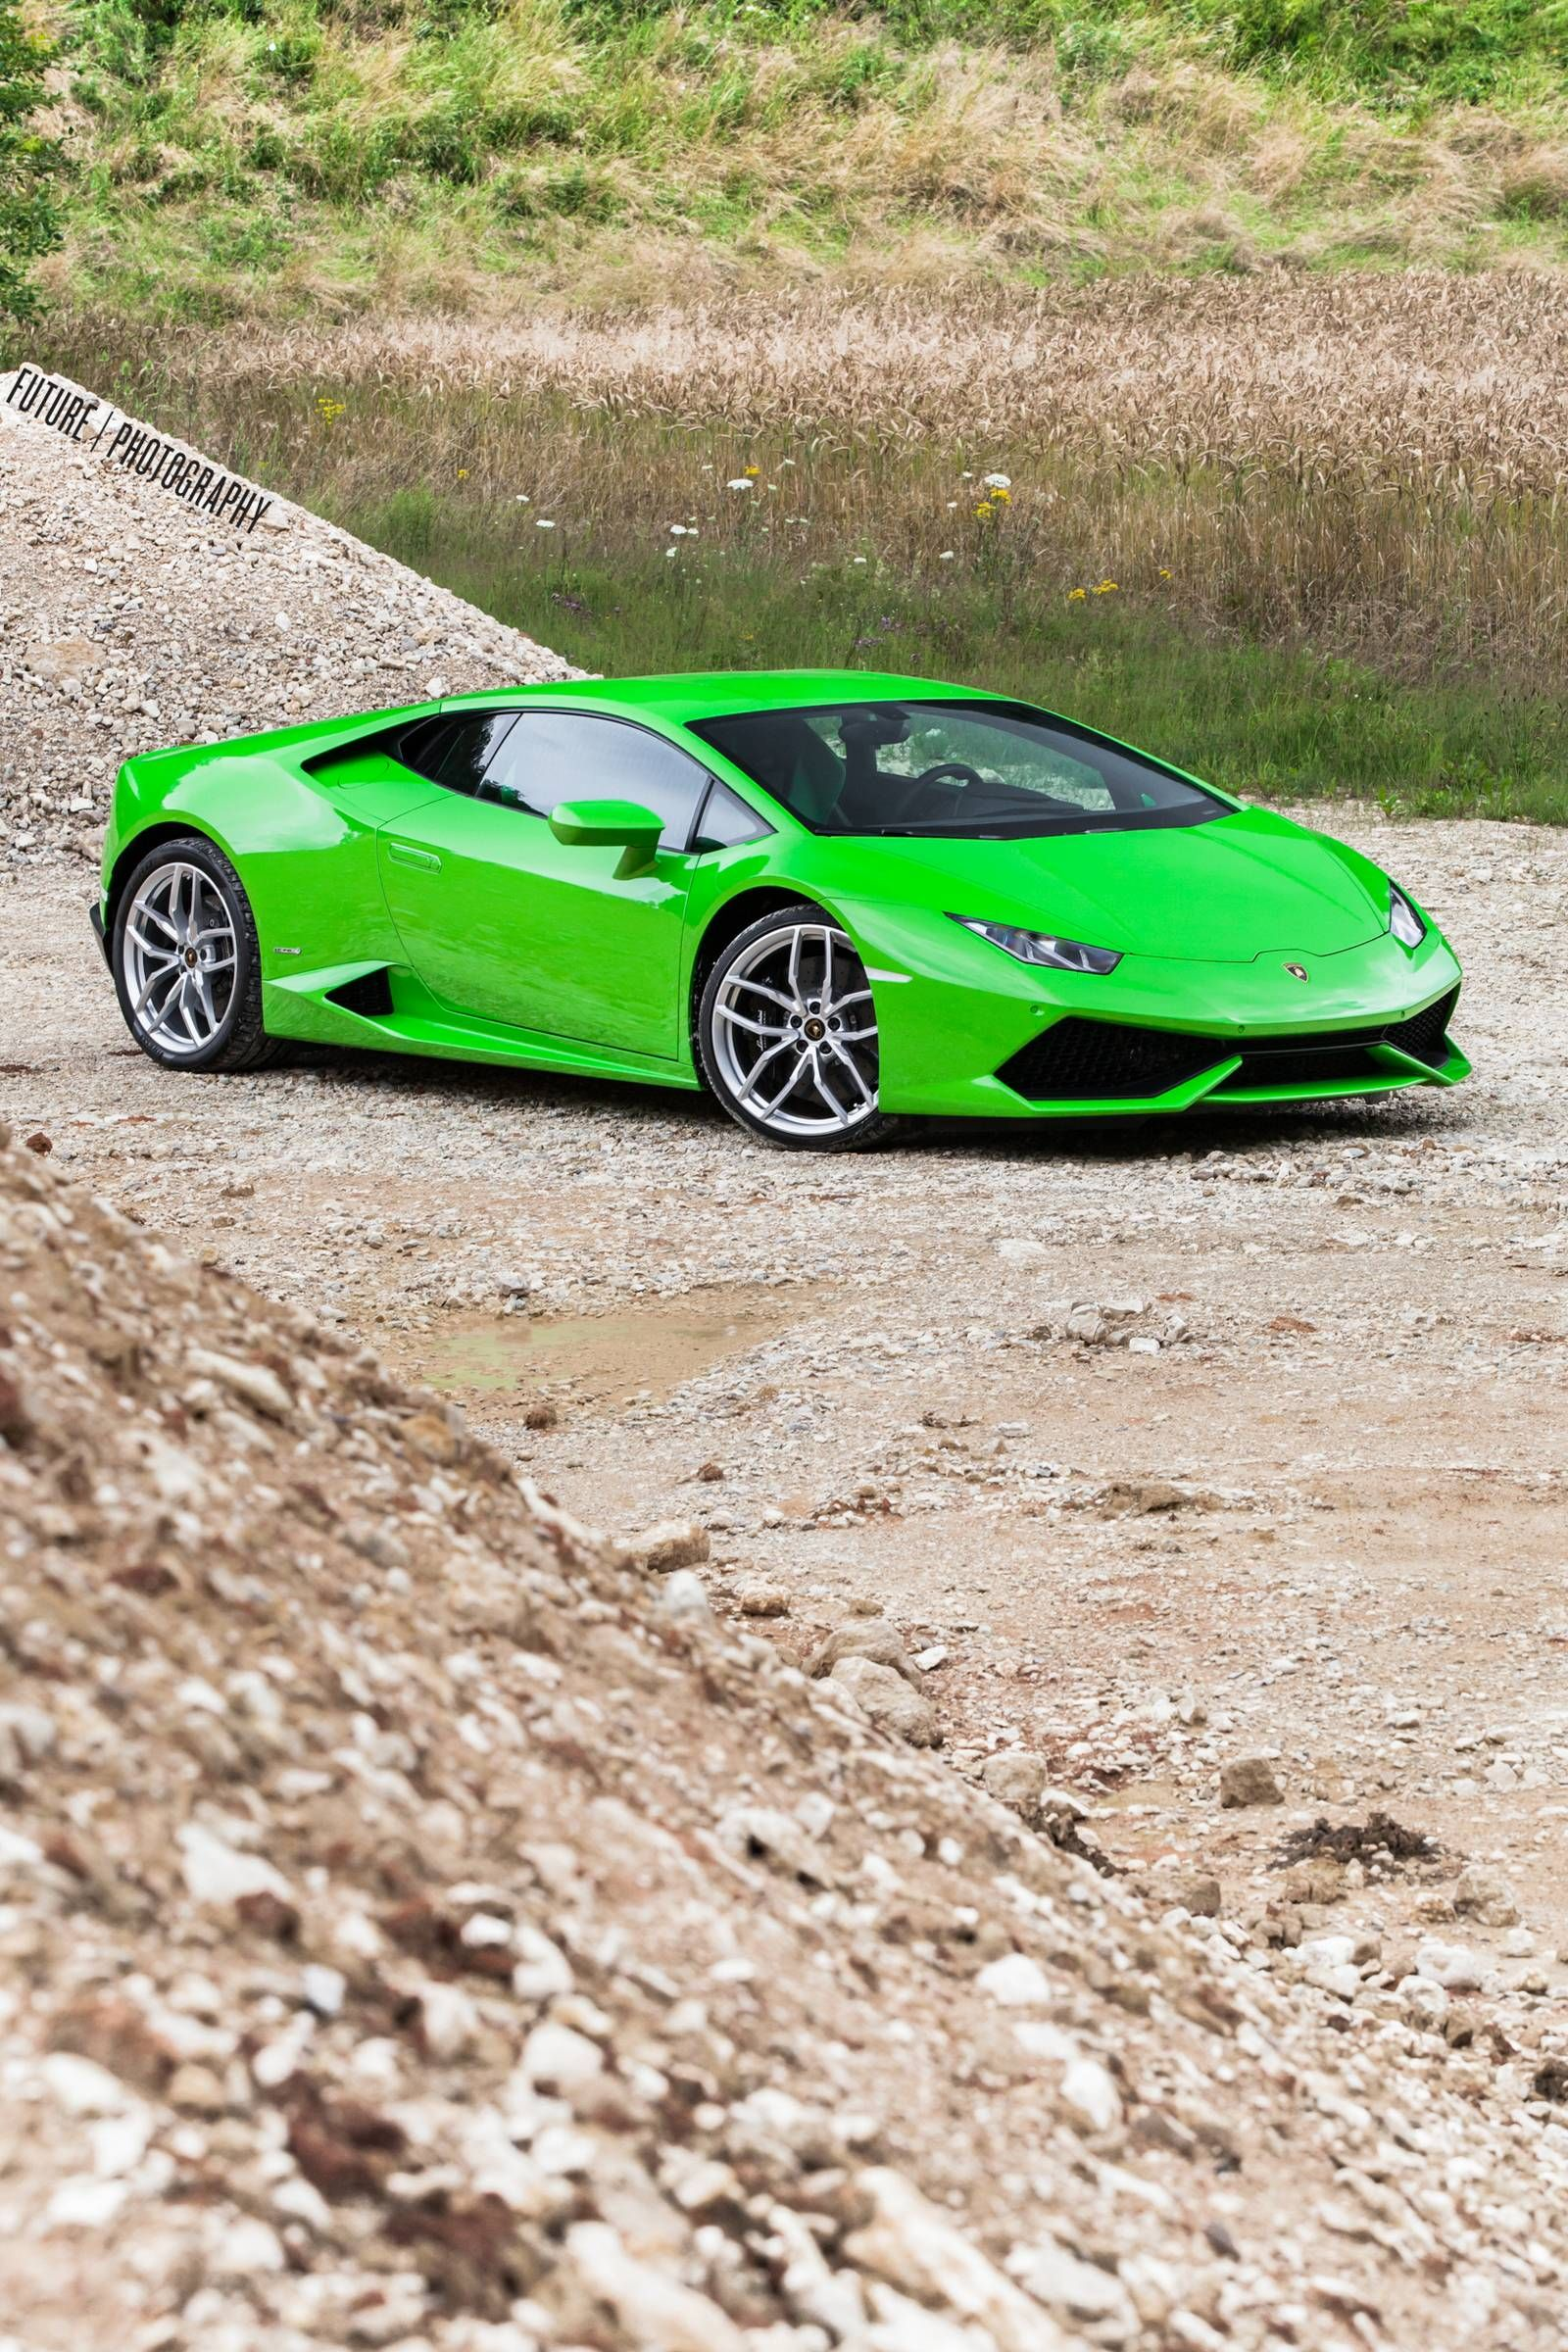 Lamborghini Huracan++++++++++++++++++ Click Fast And Analyze Your #website  Here   Www.seoanalyzehub.com